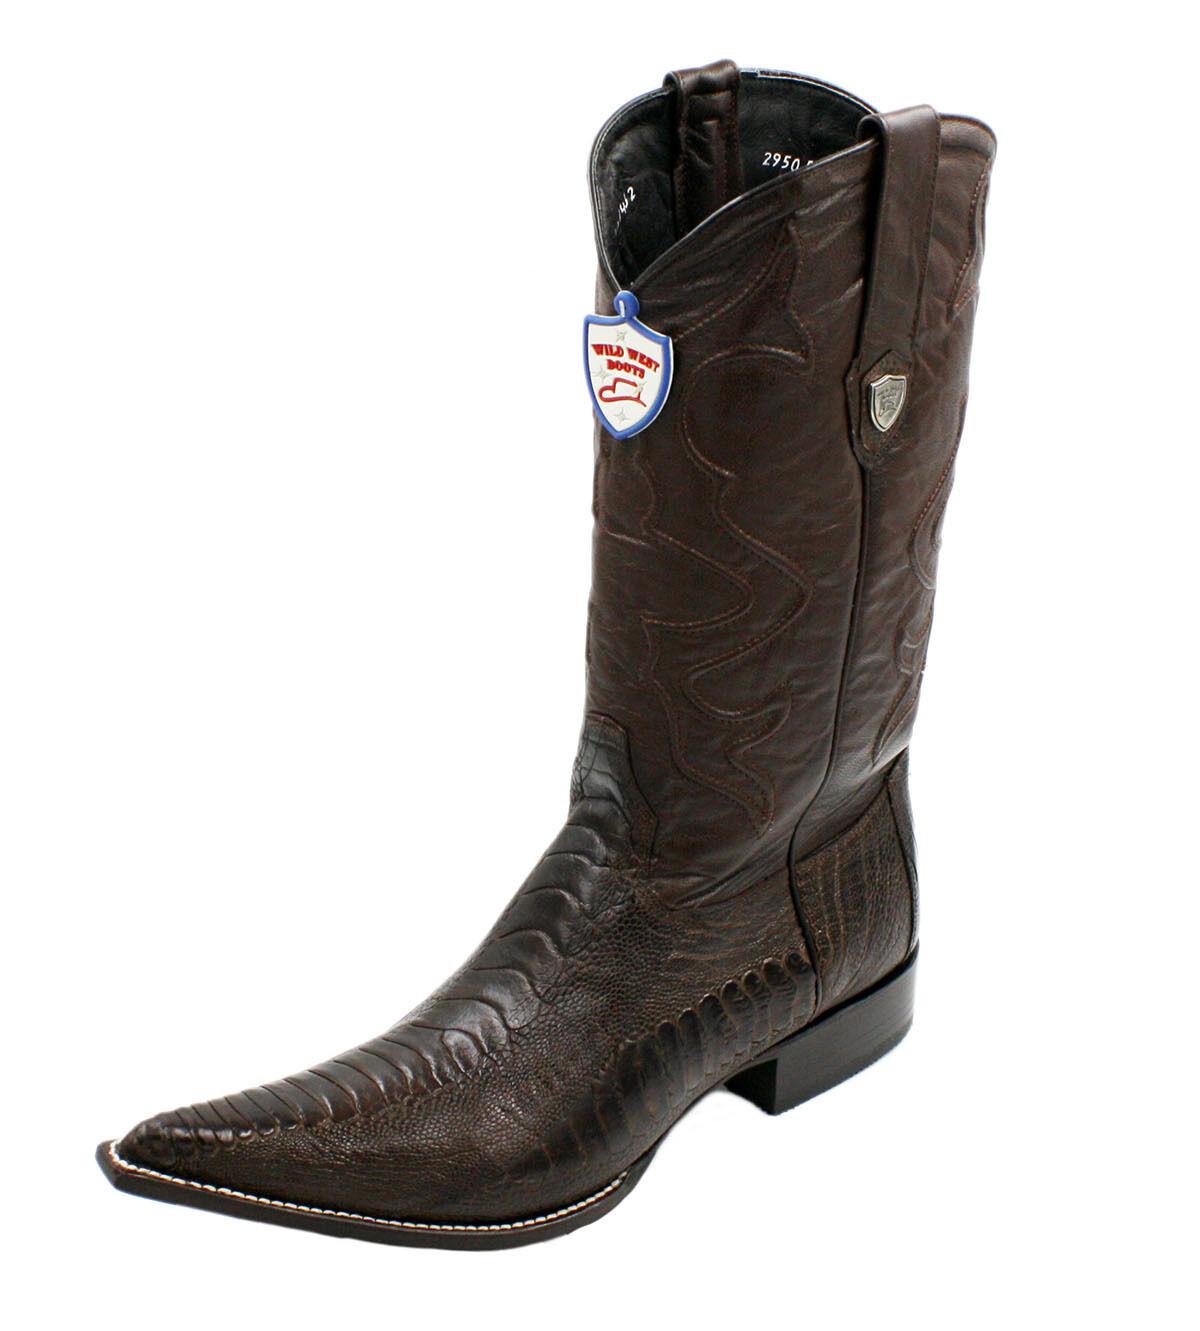 Men Genuine Ostrichleg Leather Cowboy Western Boots Snip Toe Style LA 2950507